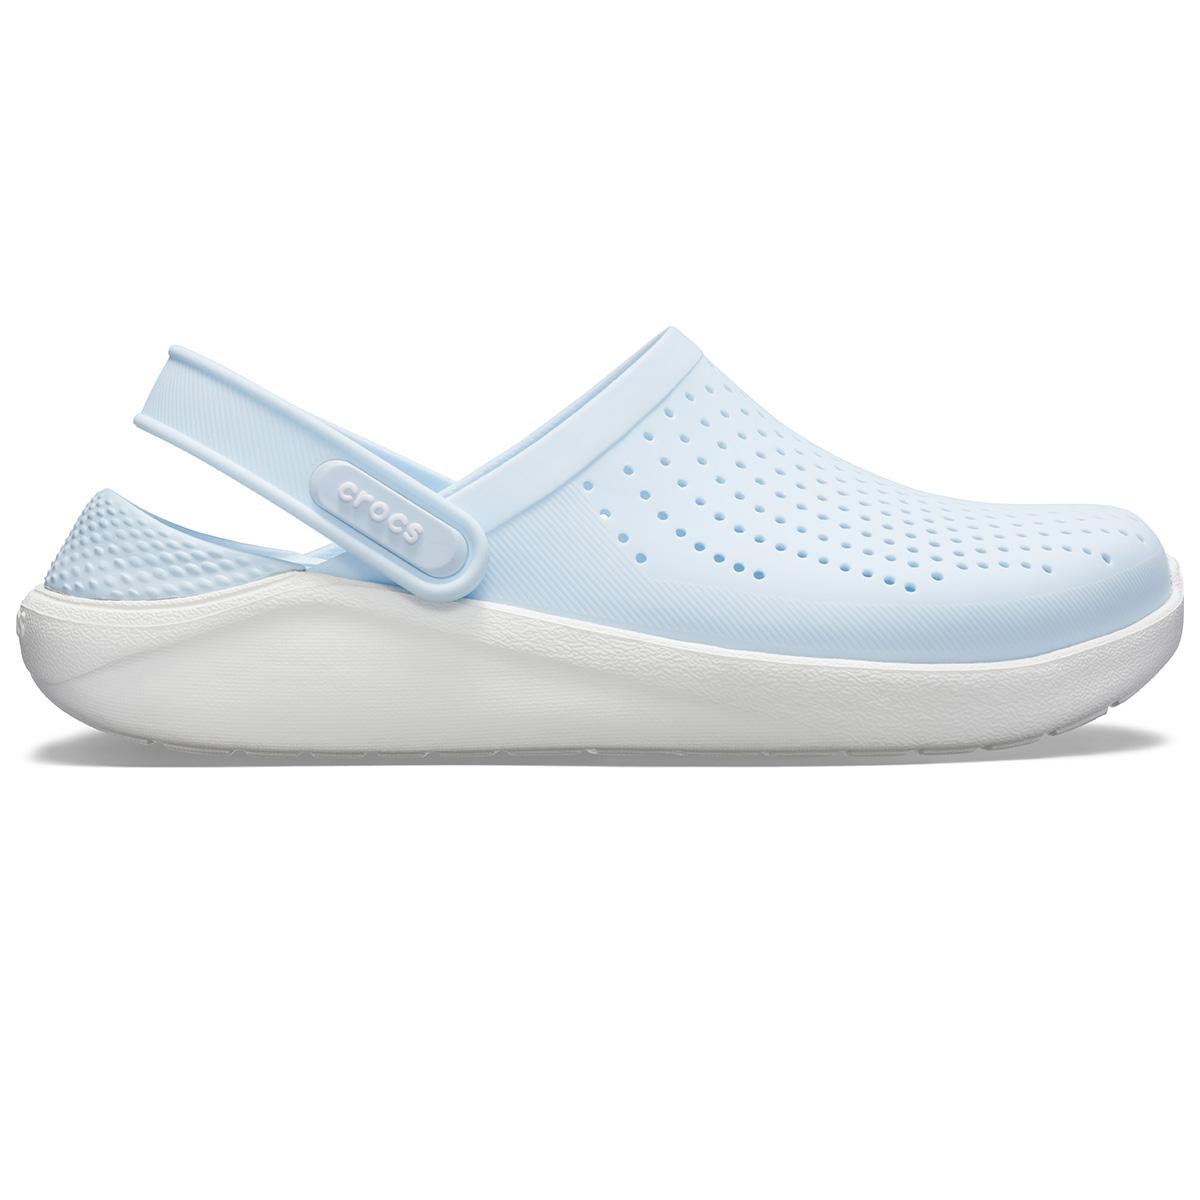 LiteRide Clog - Mineral Mavi/Beyaz